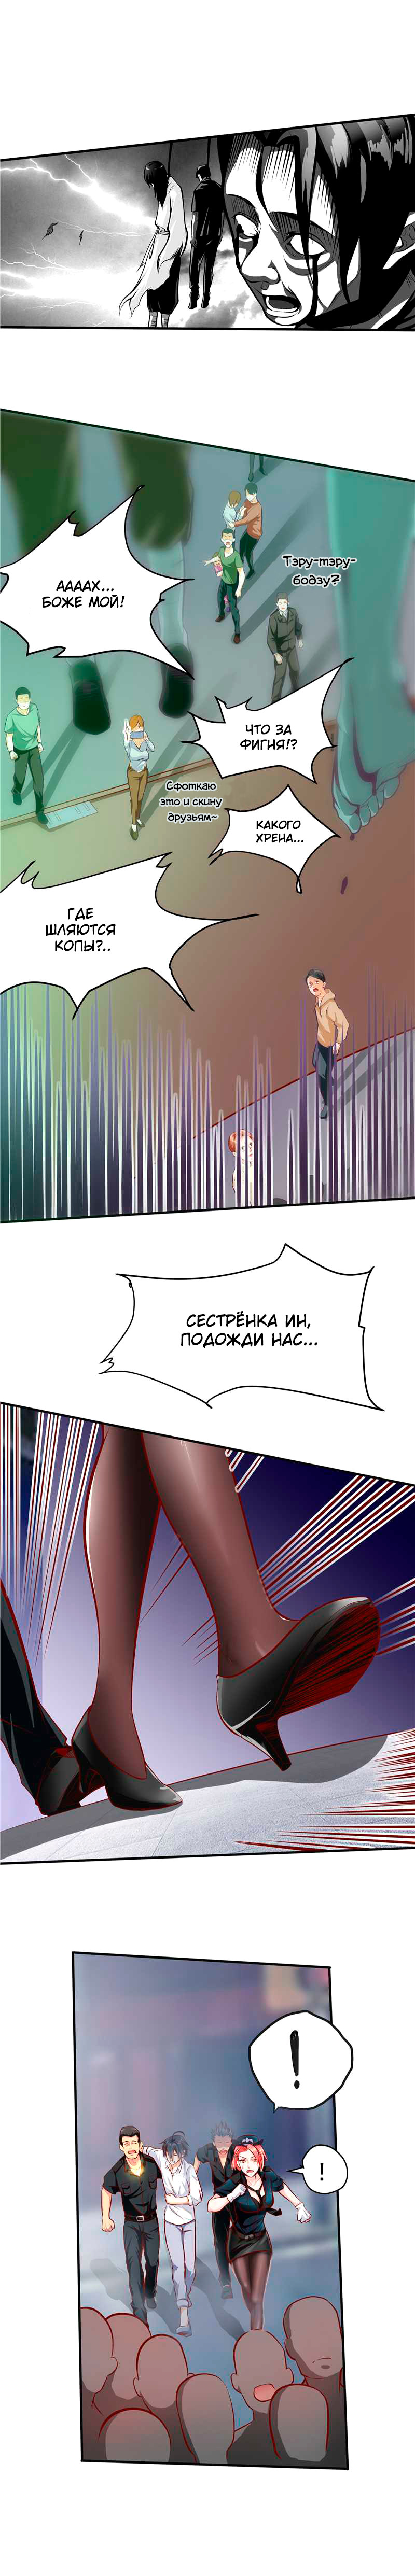 Манга Первоклассный мастер / First Rate Master  - Том 1 Глава 34 Страница 2